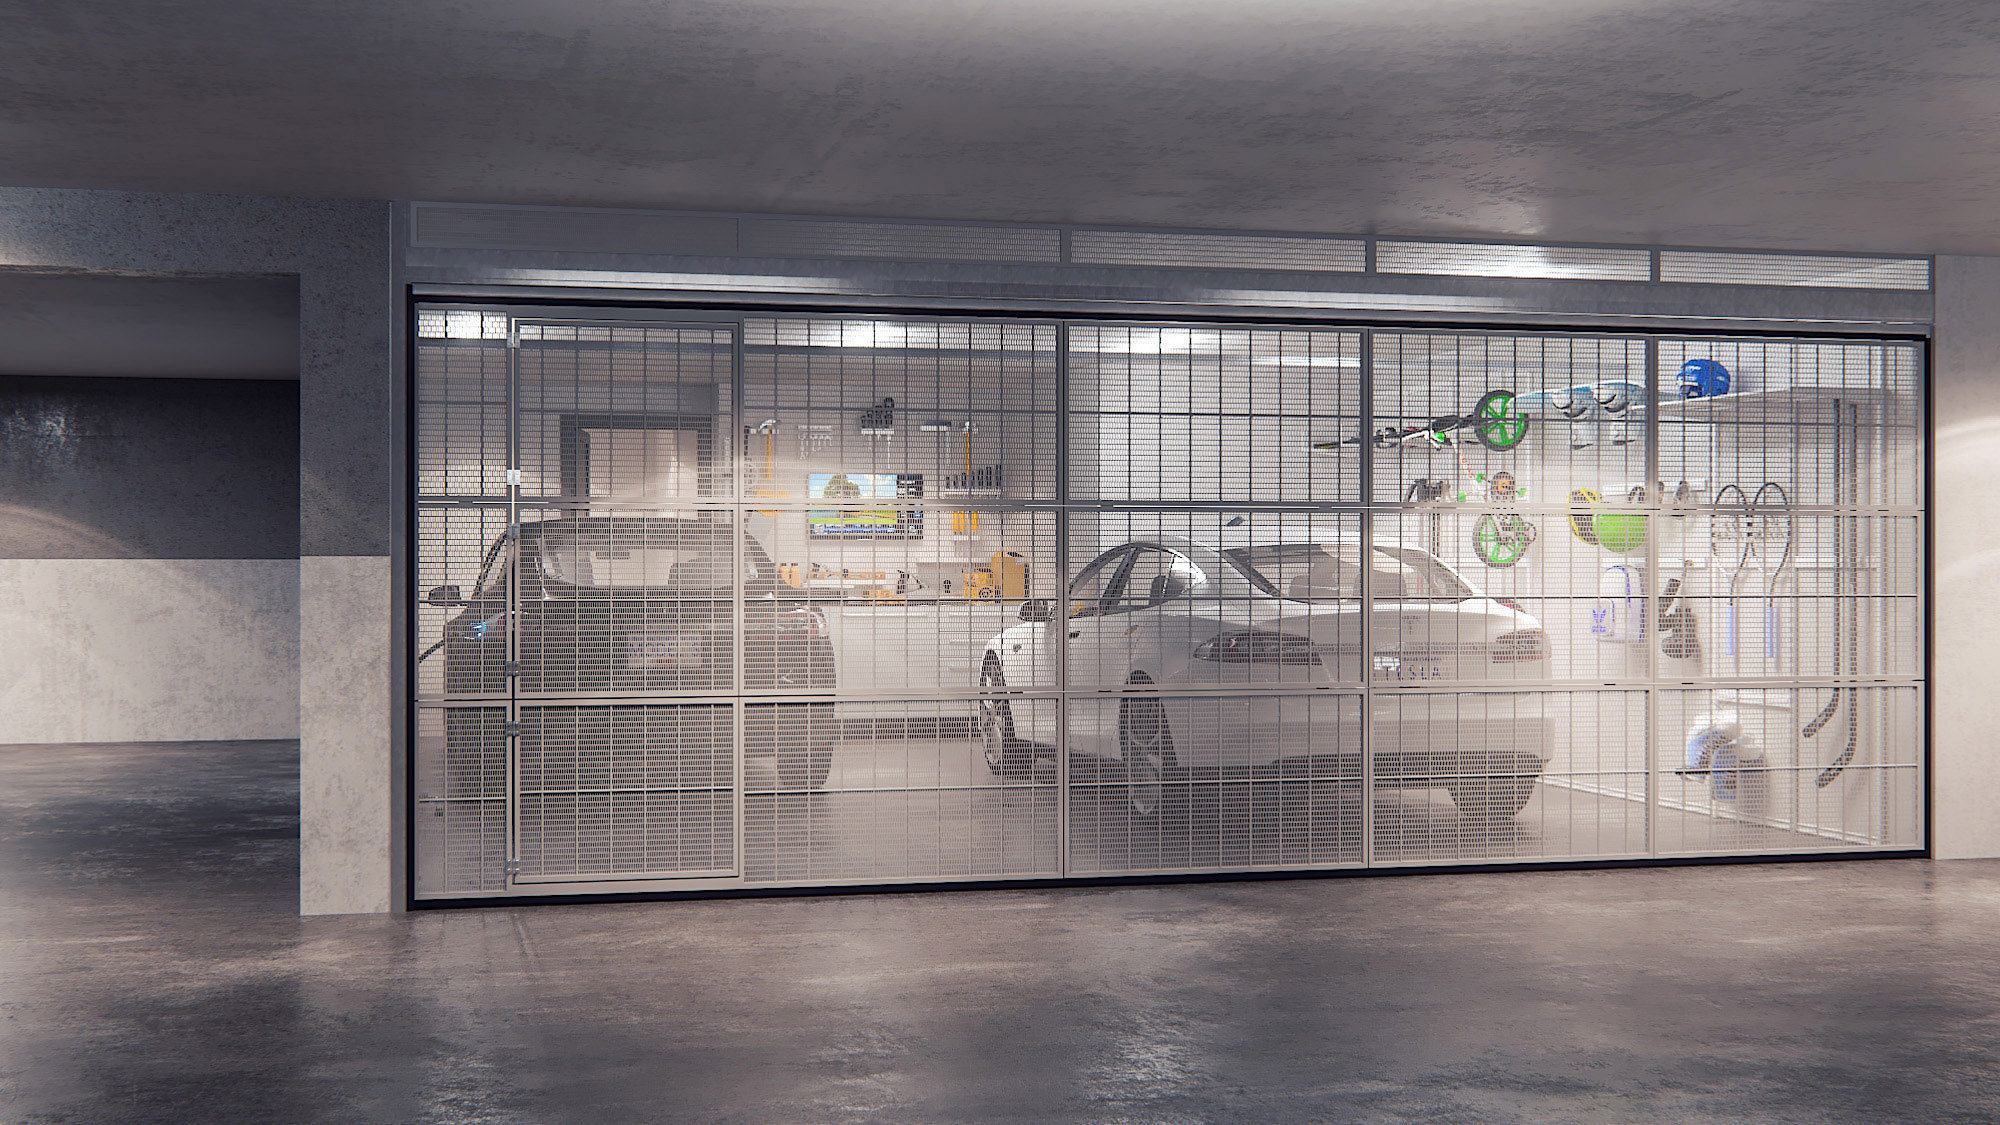 Yukon Private Garage Gate!